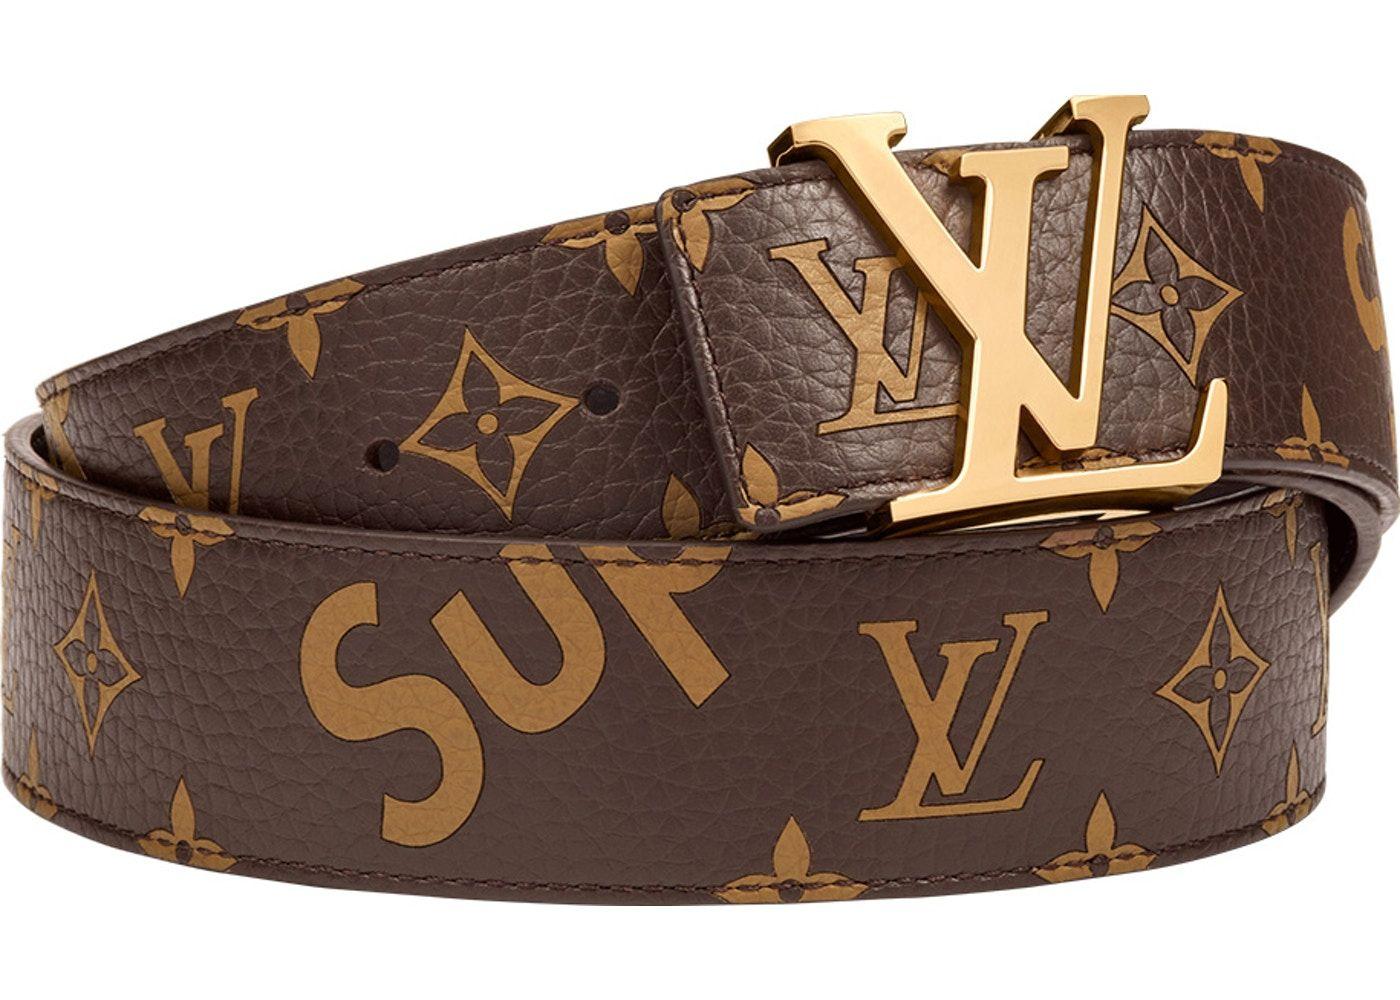 Photo of Louis Vuitton x Supreme Initiales Belt 40 MM Monogram Brown Gold